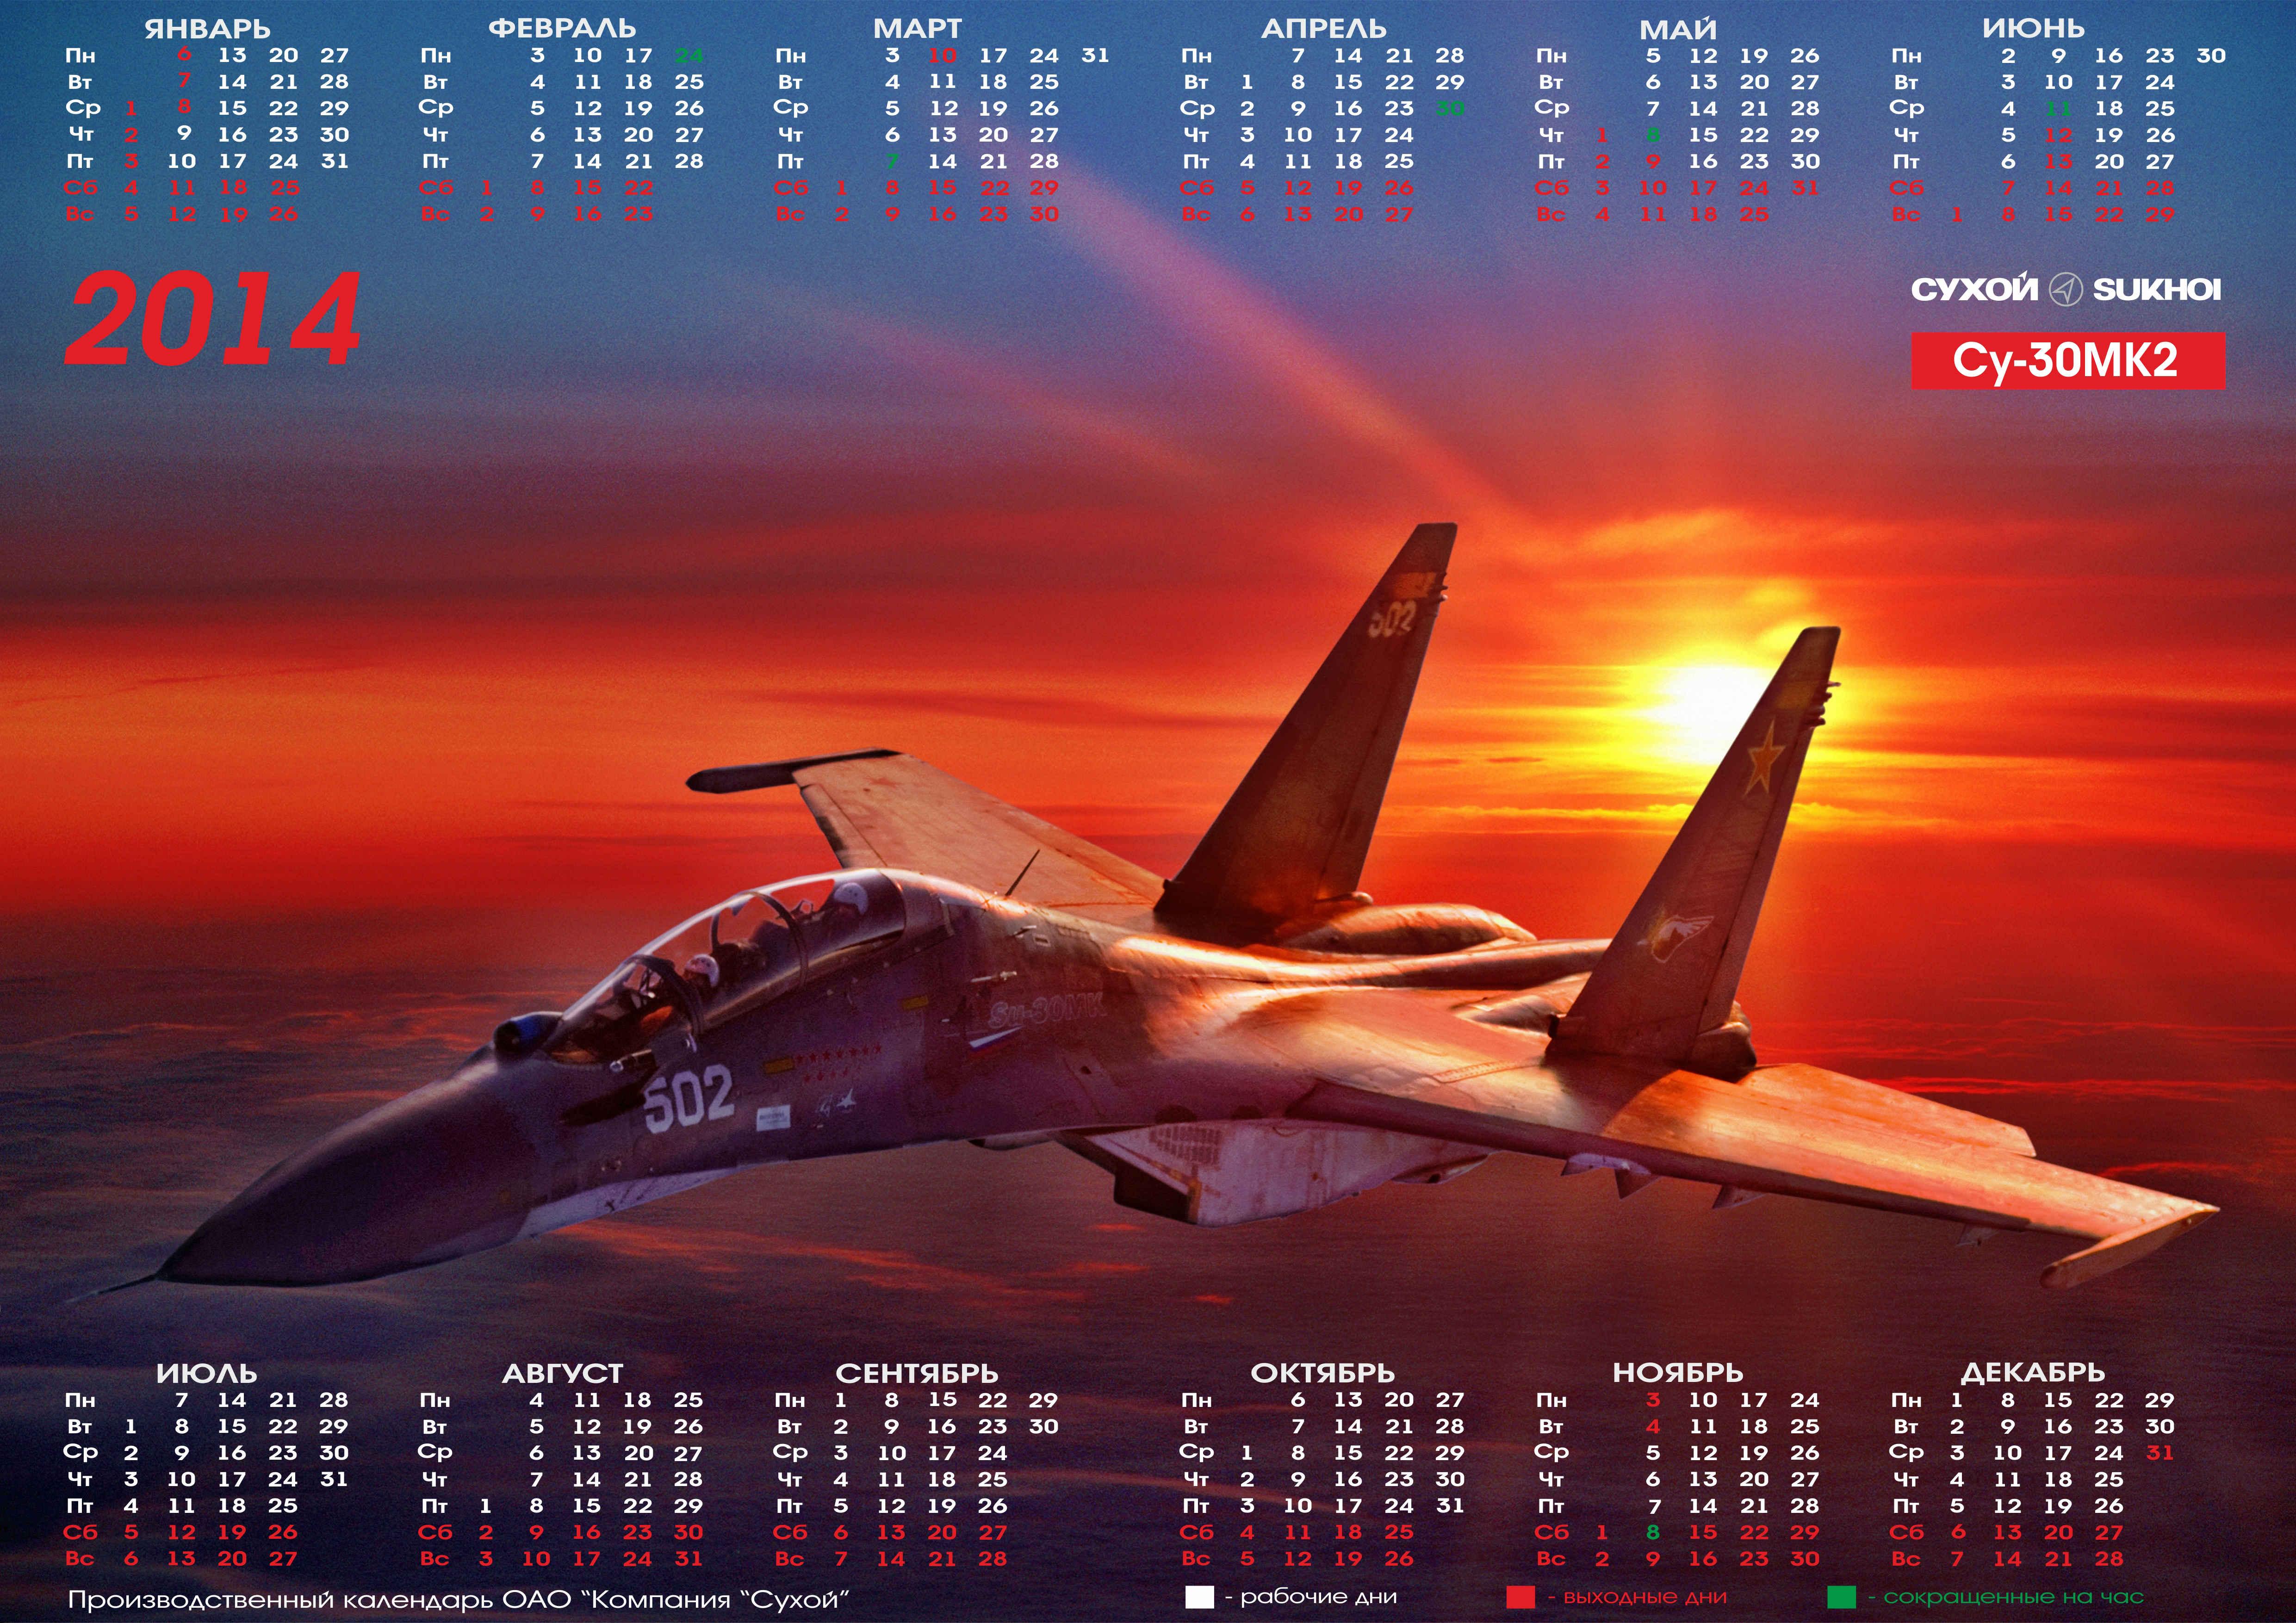 http://www.mycity-military.com/imgs3/65492_51496892_image000.jpg